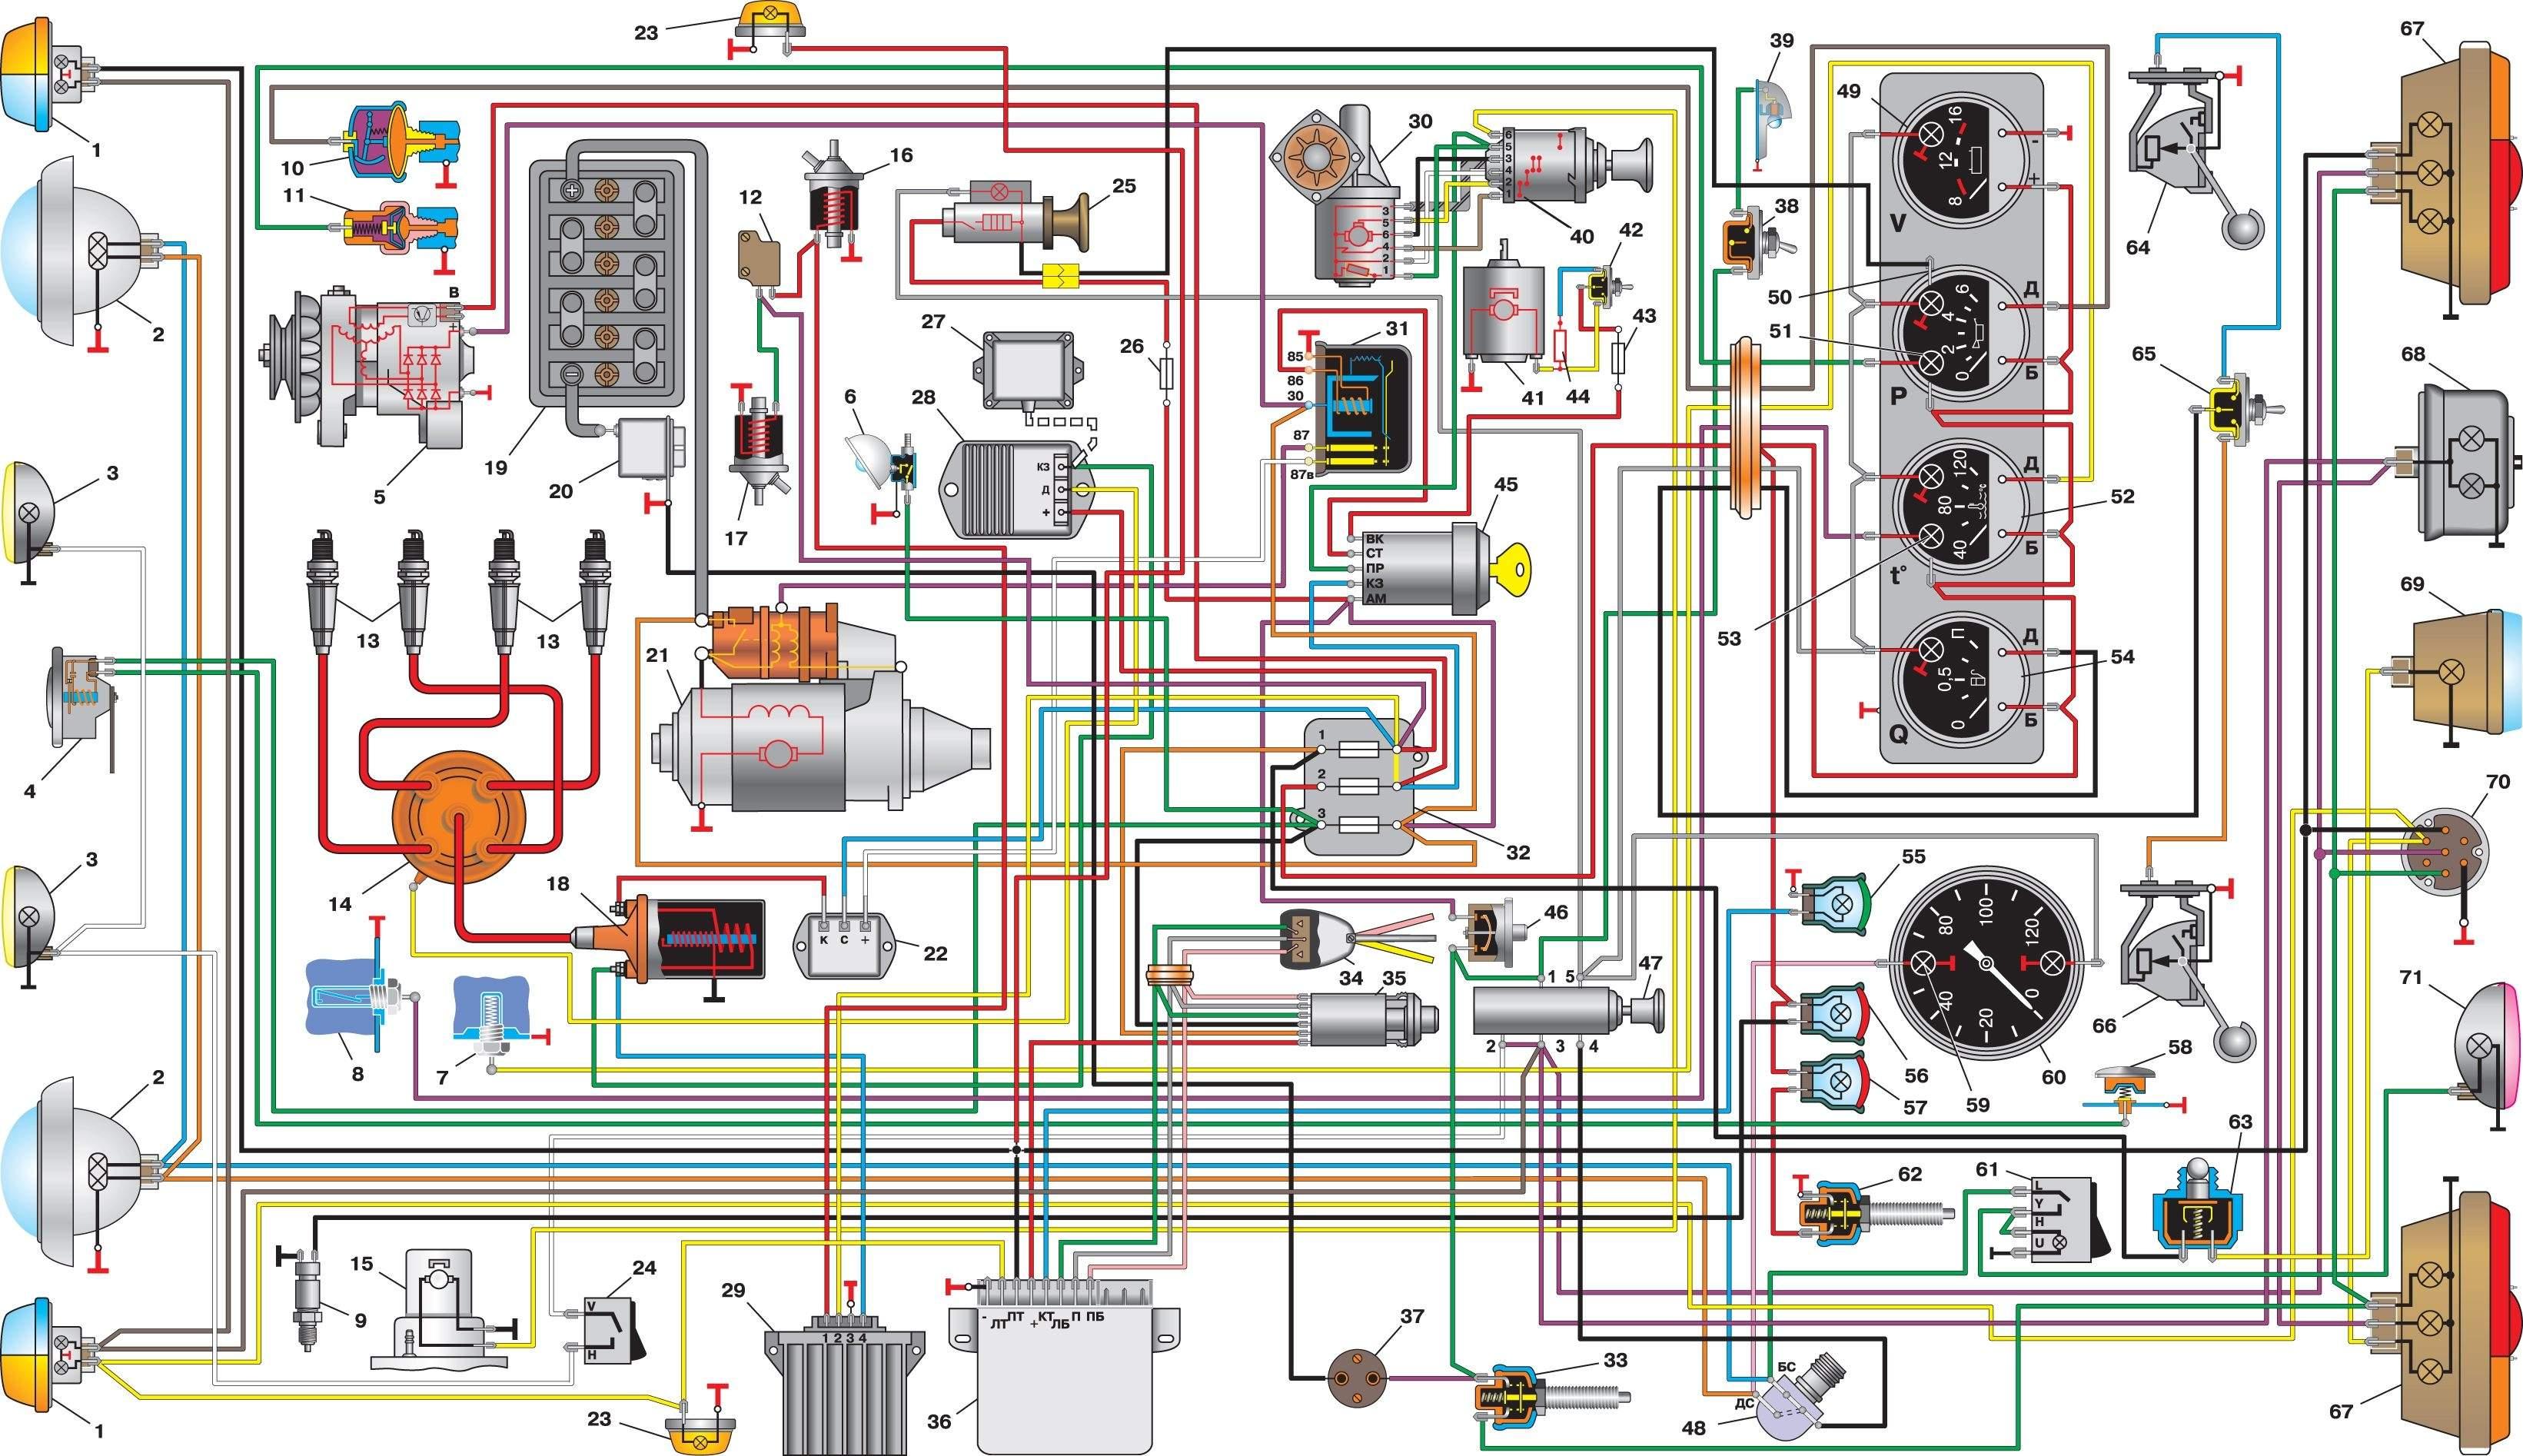 Схема электрооборудования иж 27175 инжектор 90